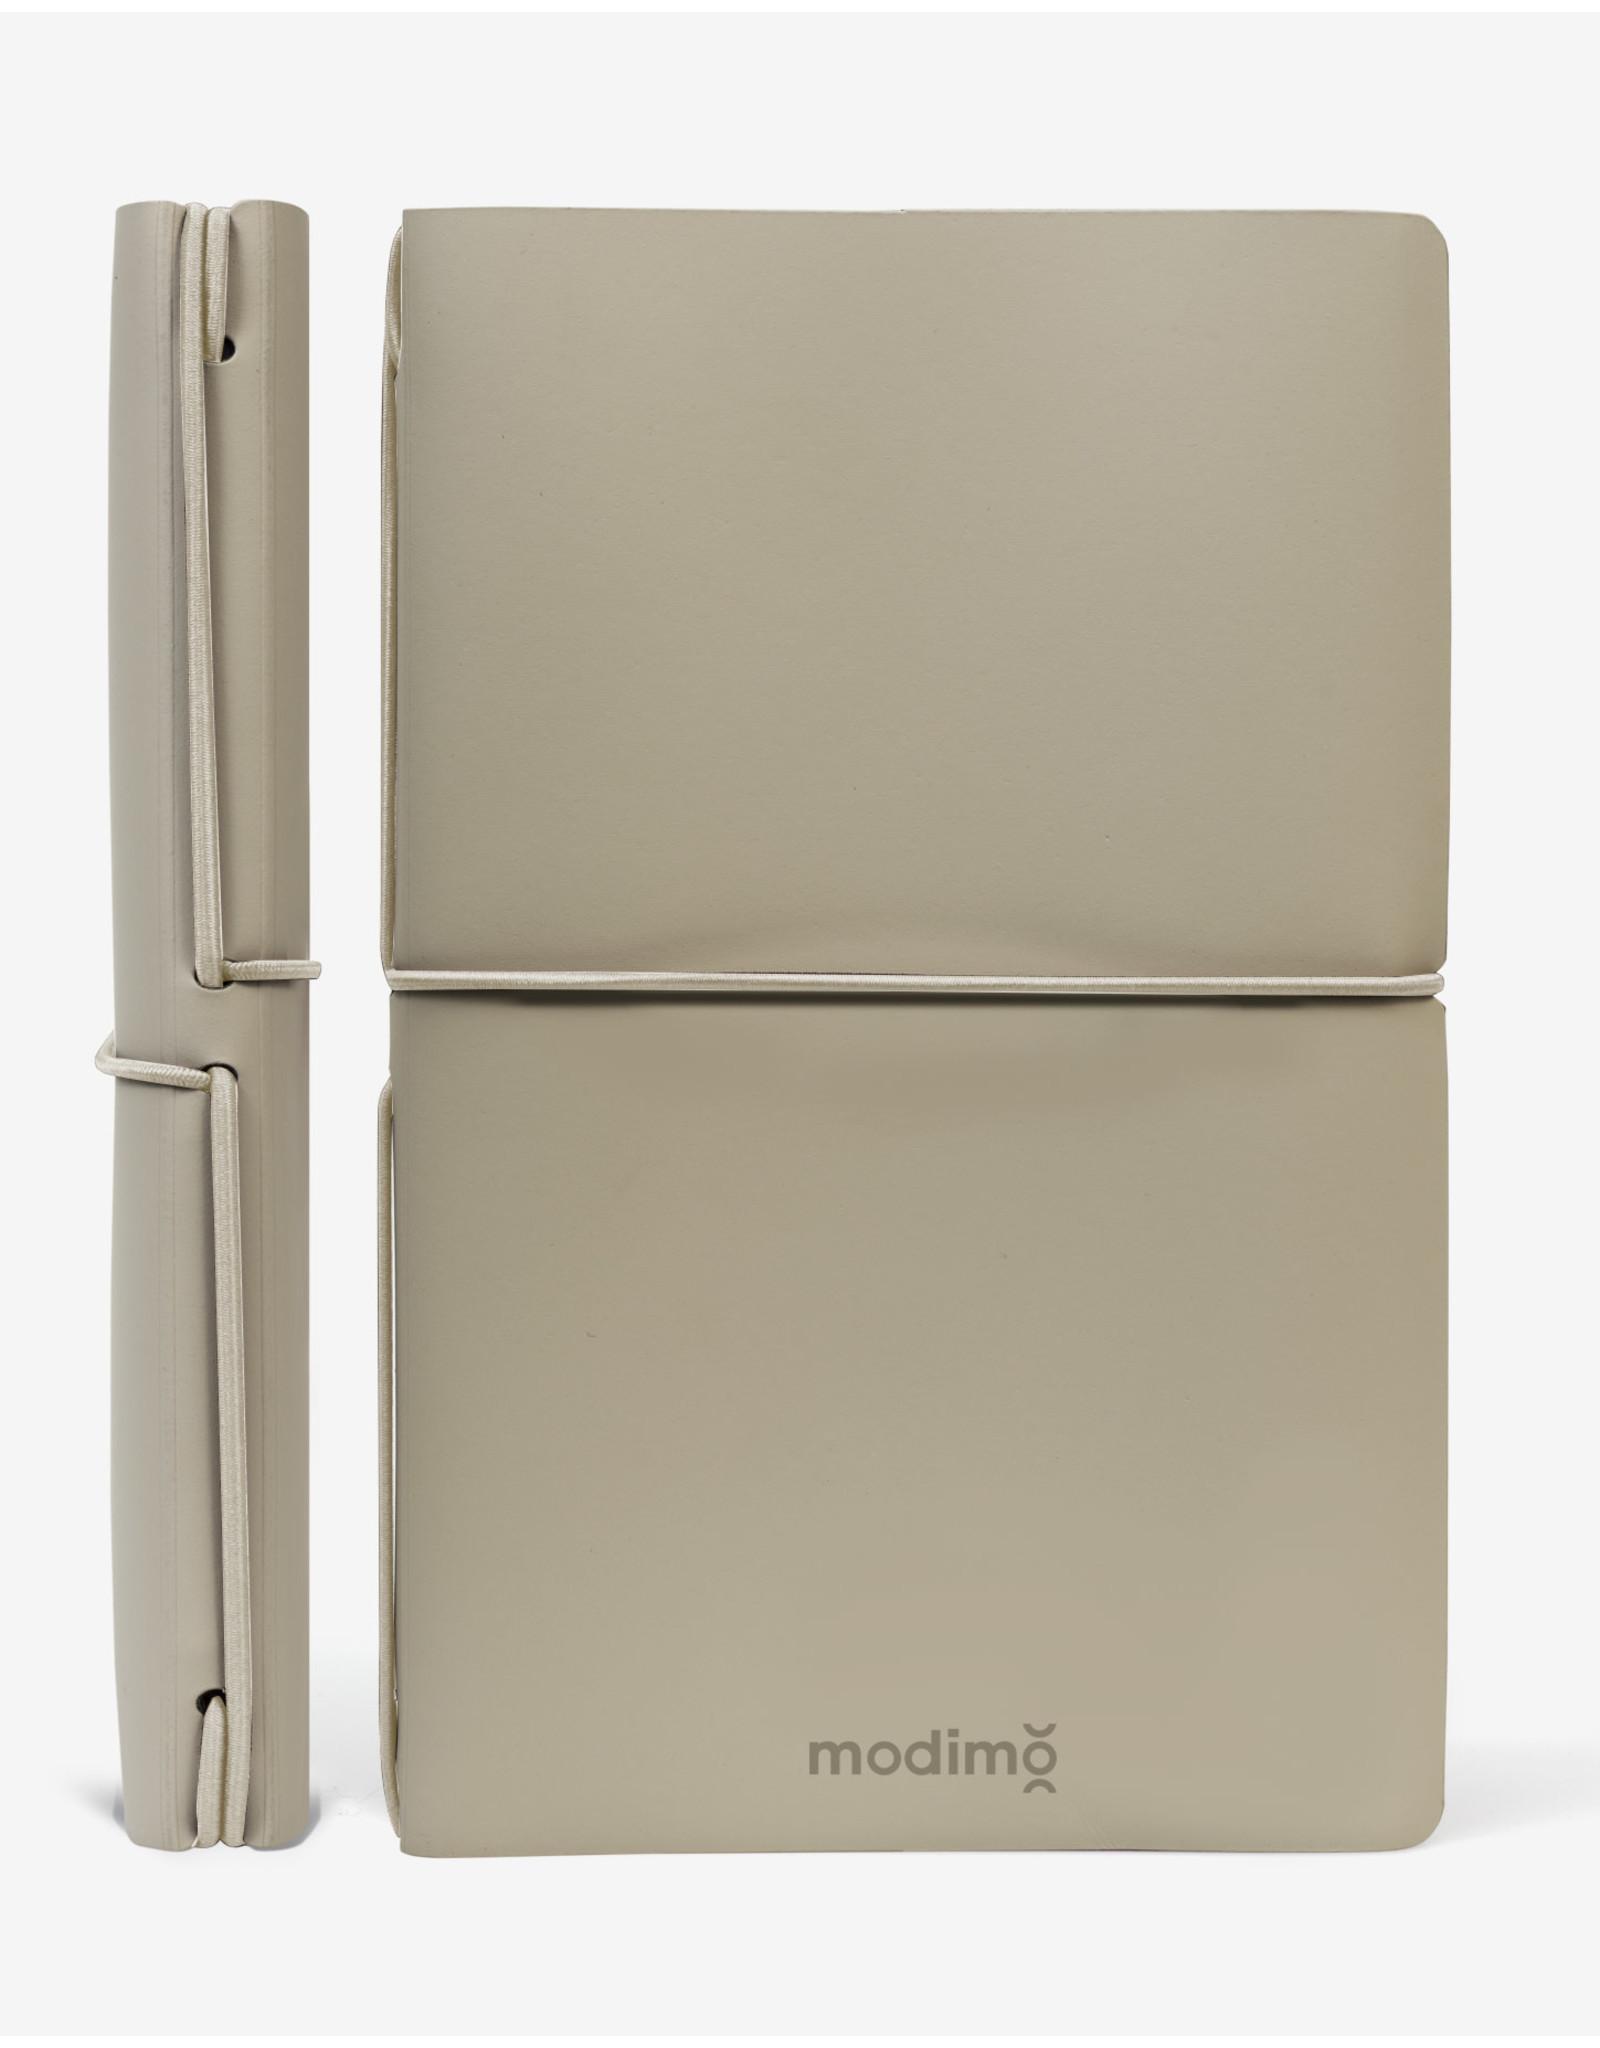 Modimo Bullet journal Beige - My plan - White - 13 x 21 cm - Flexible regenerated leather